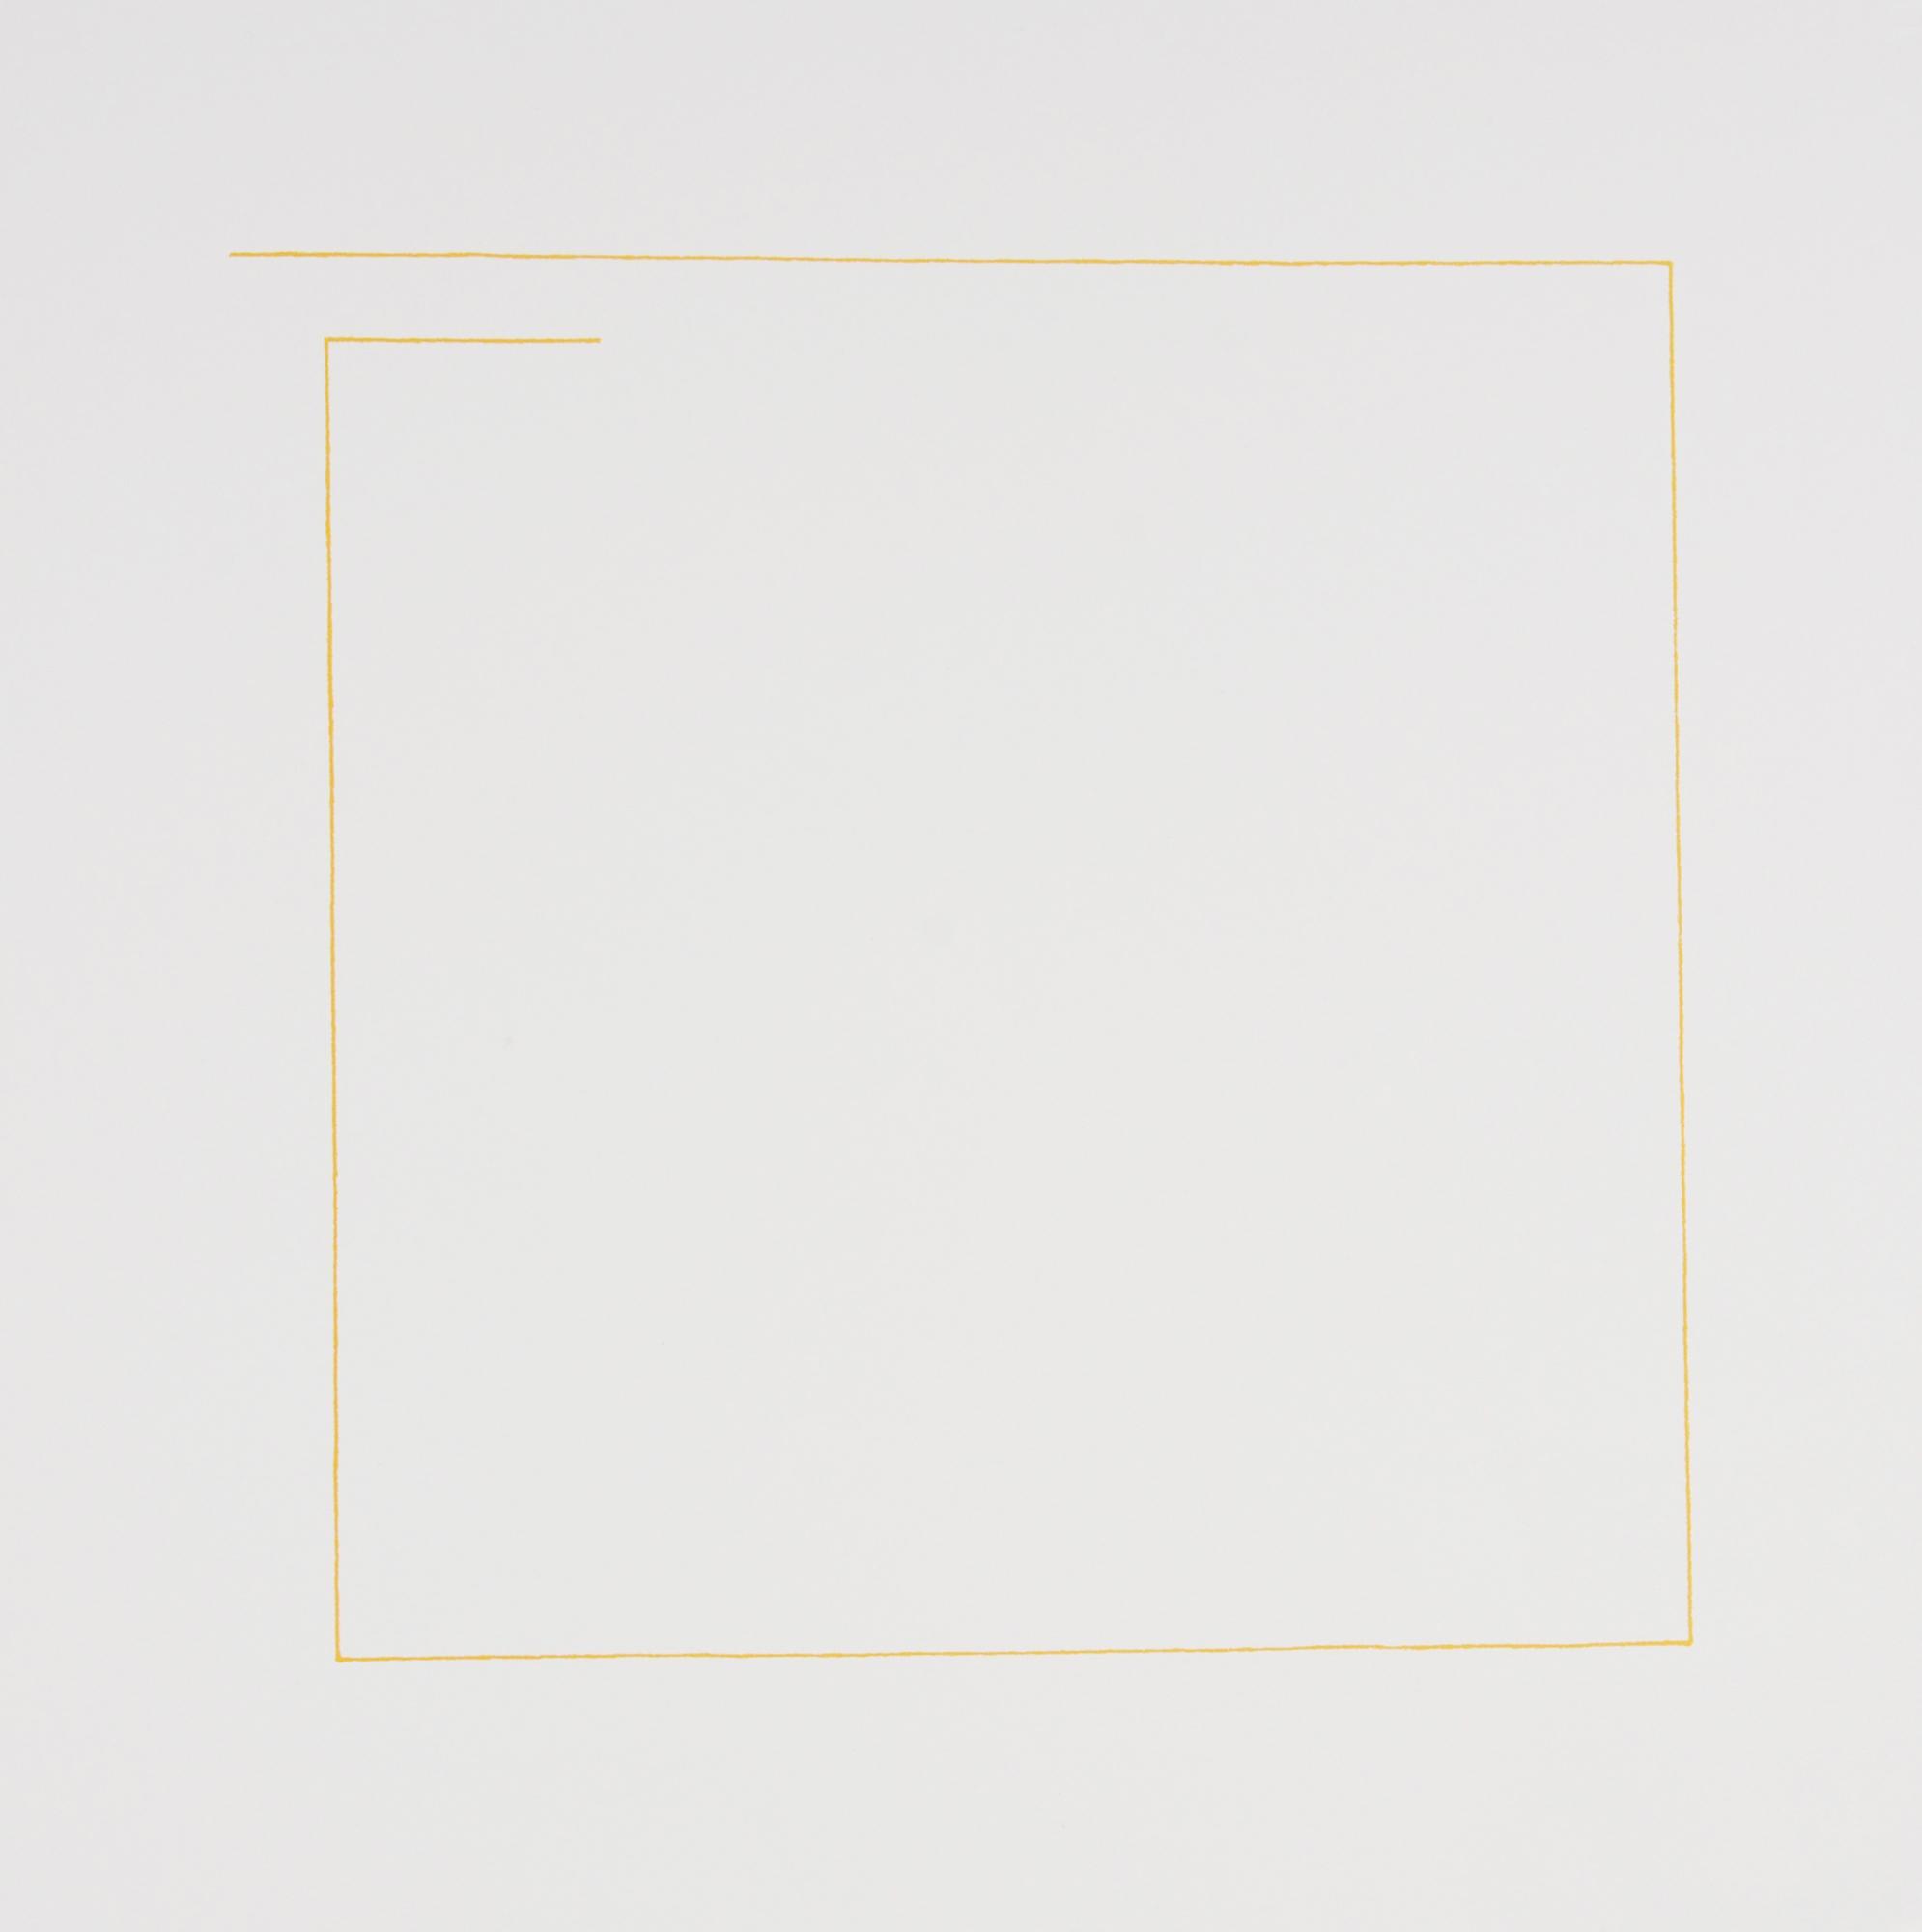 Mangold Robert, Yellow Line Print